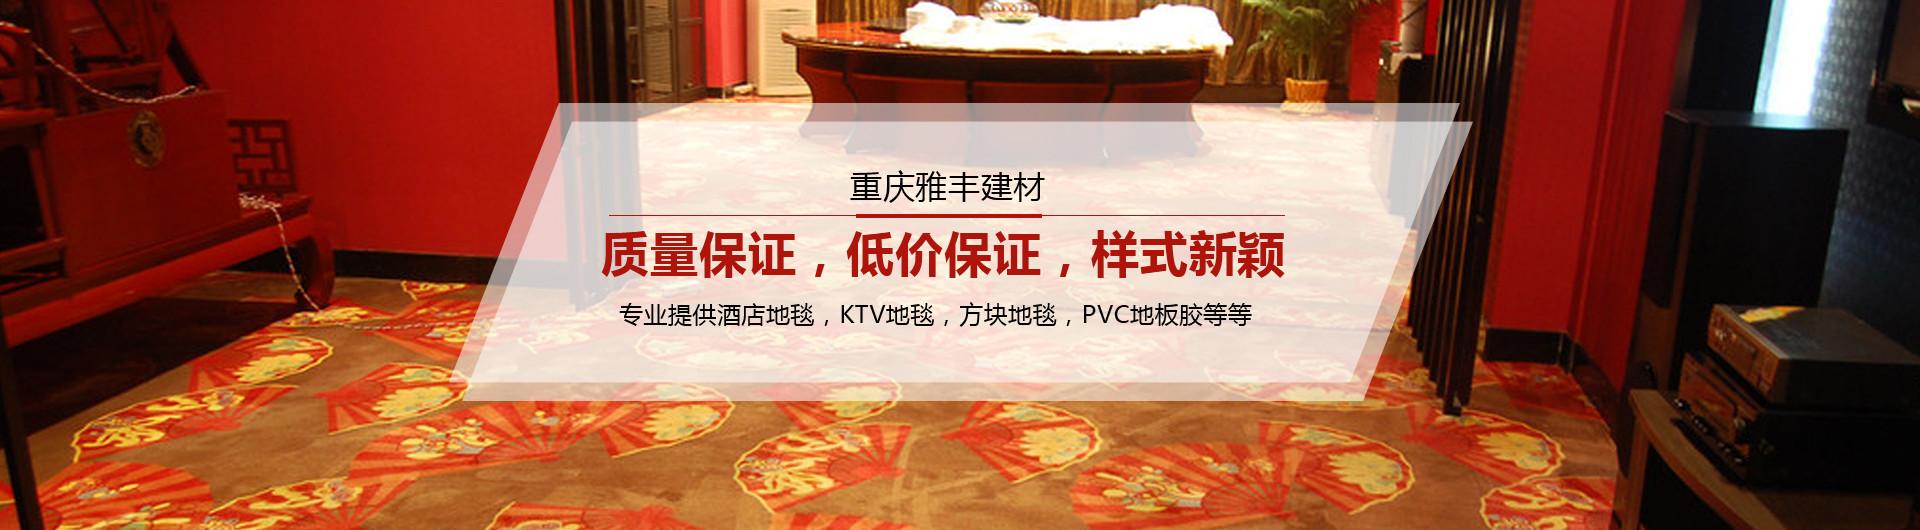 manbetx官网下载PVC万博manbetx网站